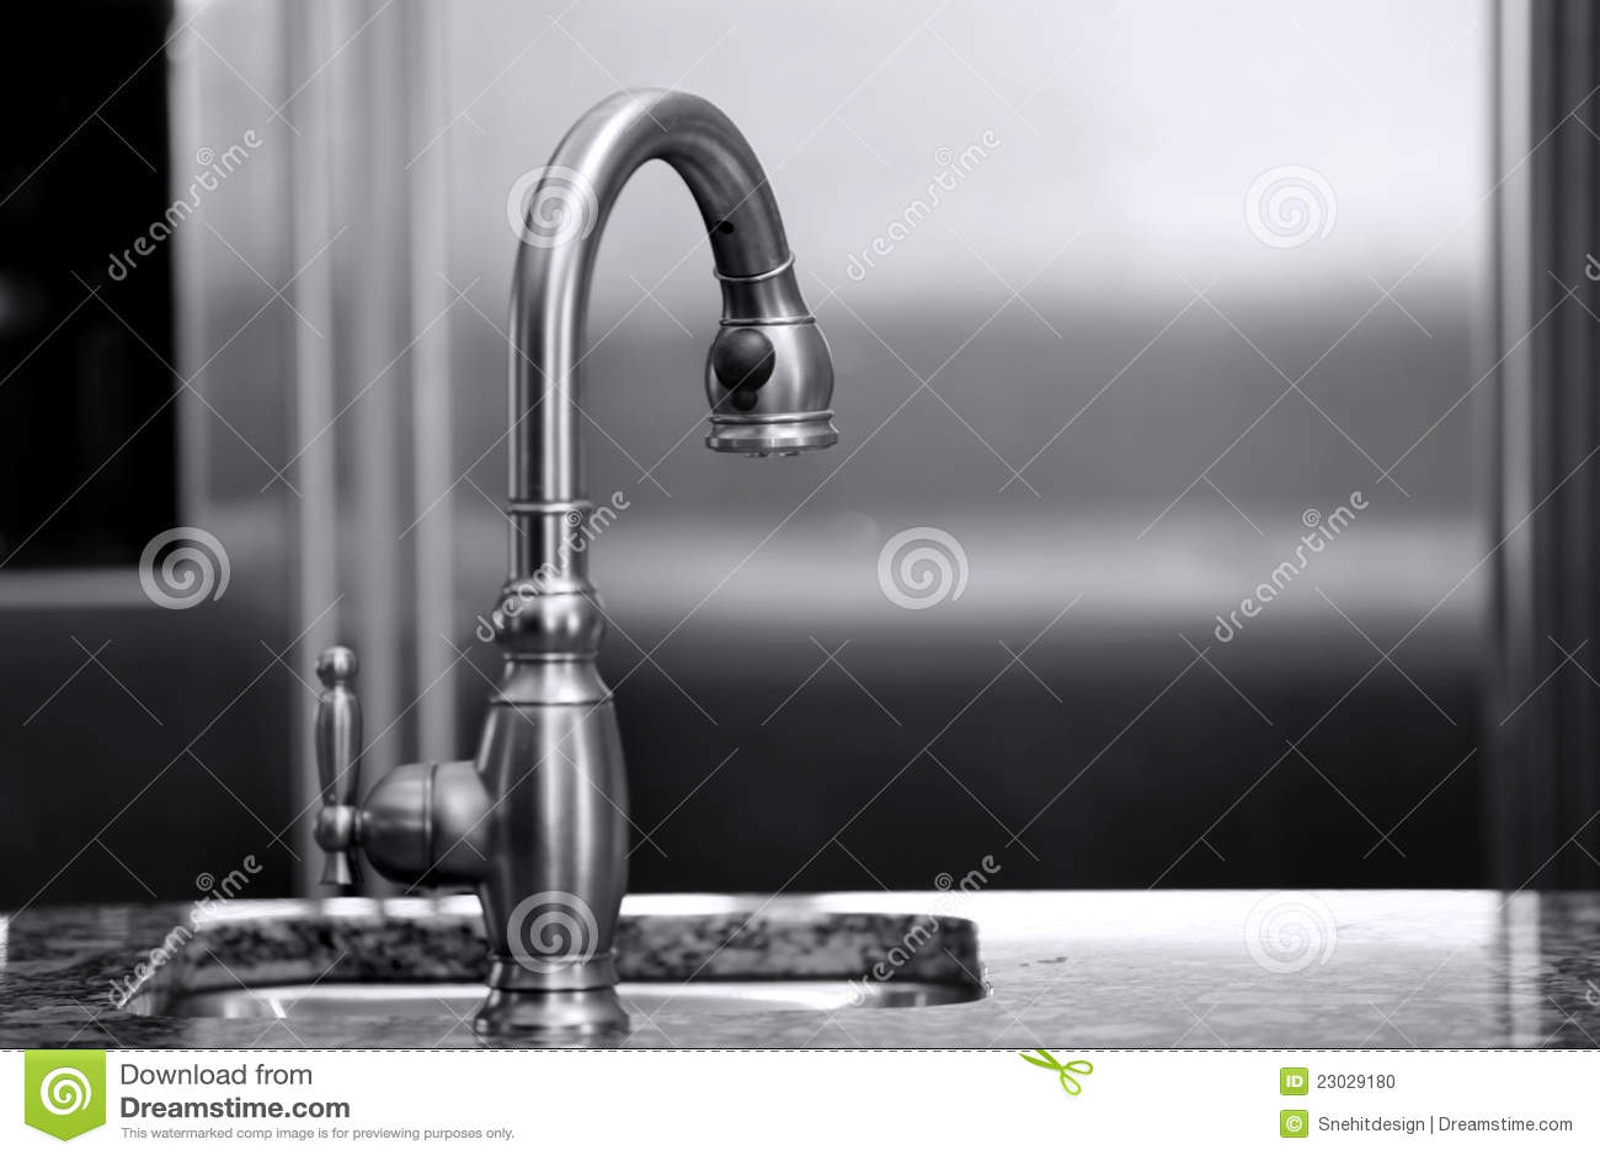 Robinet lavabo salle de bain ikea for Robinet salle de bain ikea